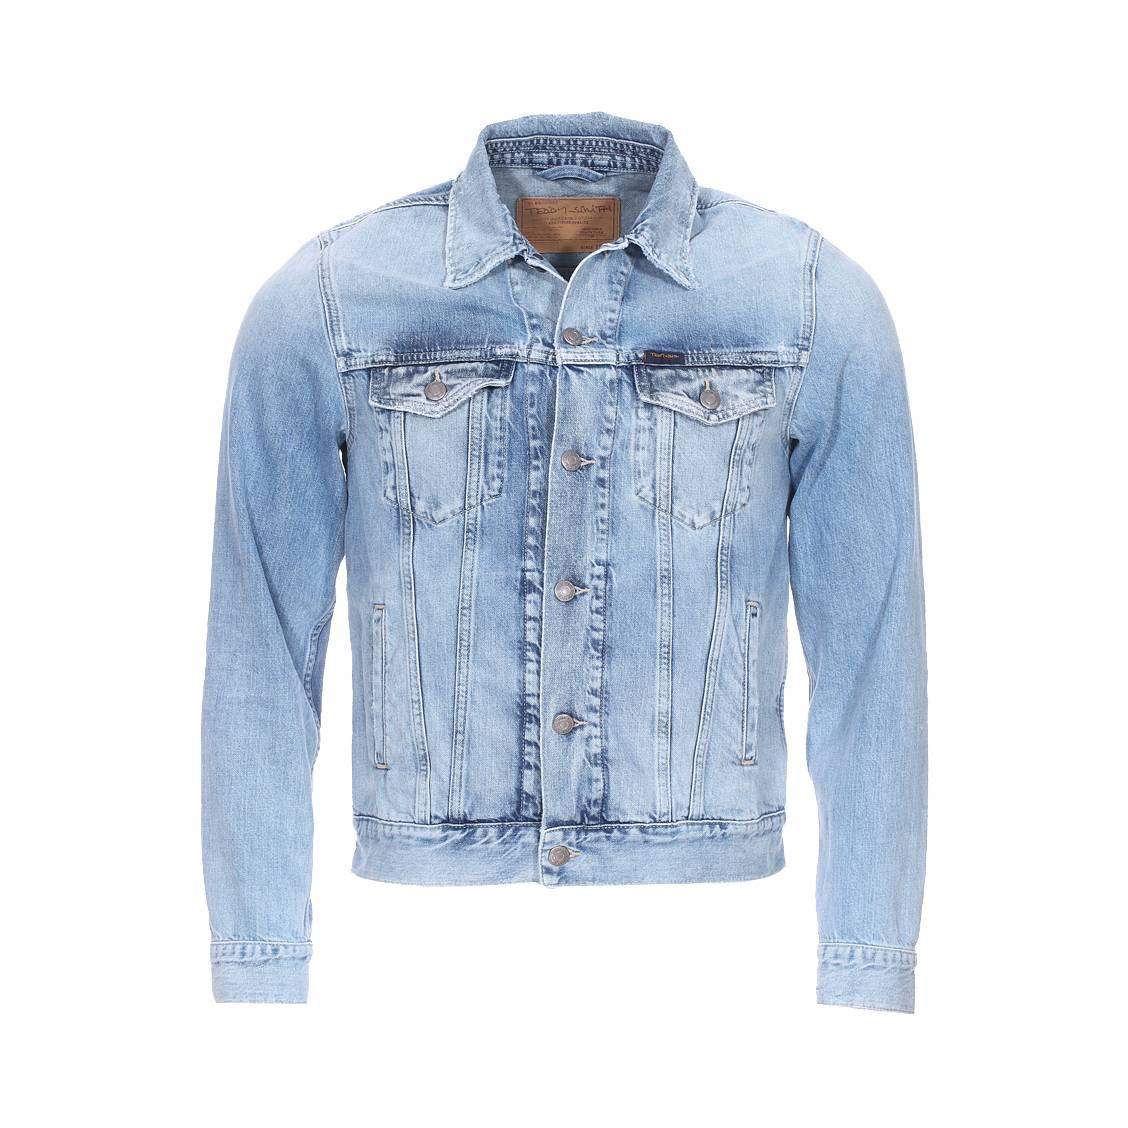 Blouson en jean  randall iconic en coton bleu clair délavé